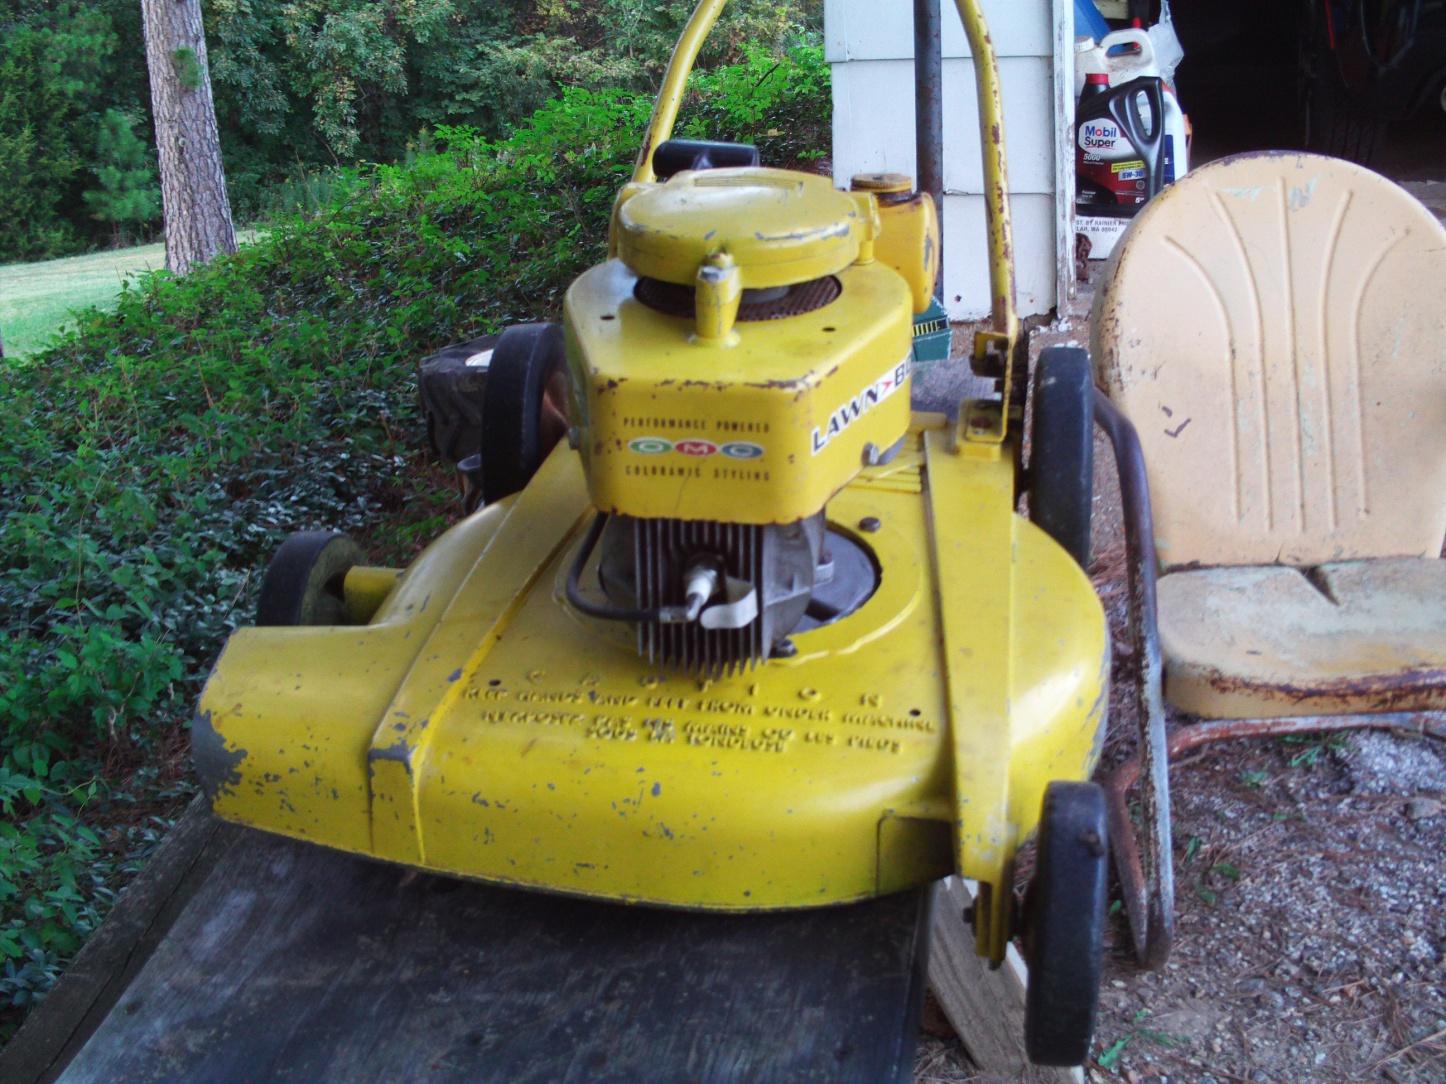 model 3051 buttercup mytractorforumcom the friendliest tractor